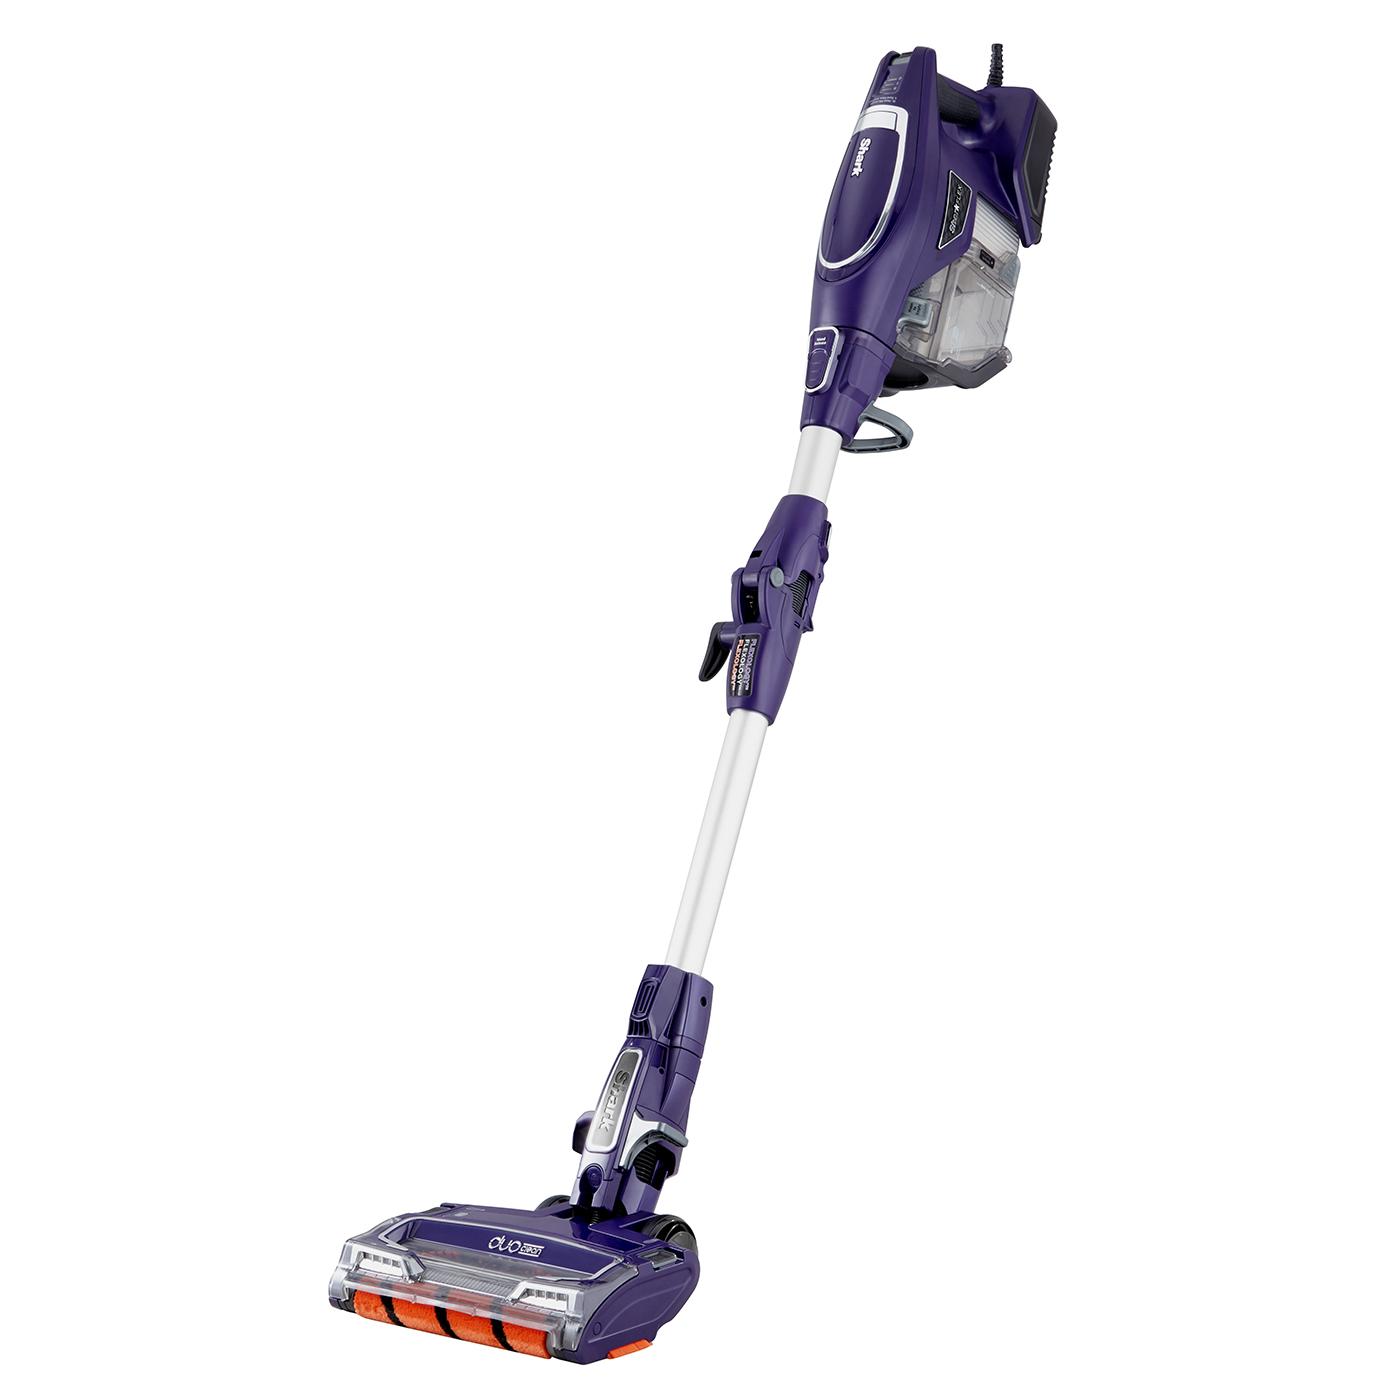 Shark DuoClean Stick Vacuum Cleaner HV390UK